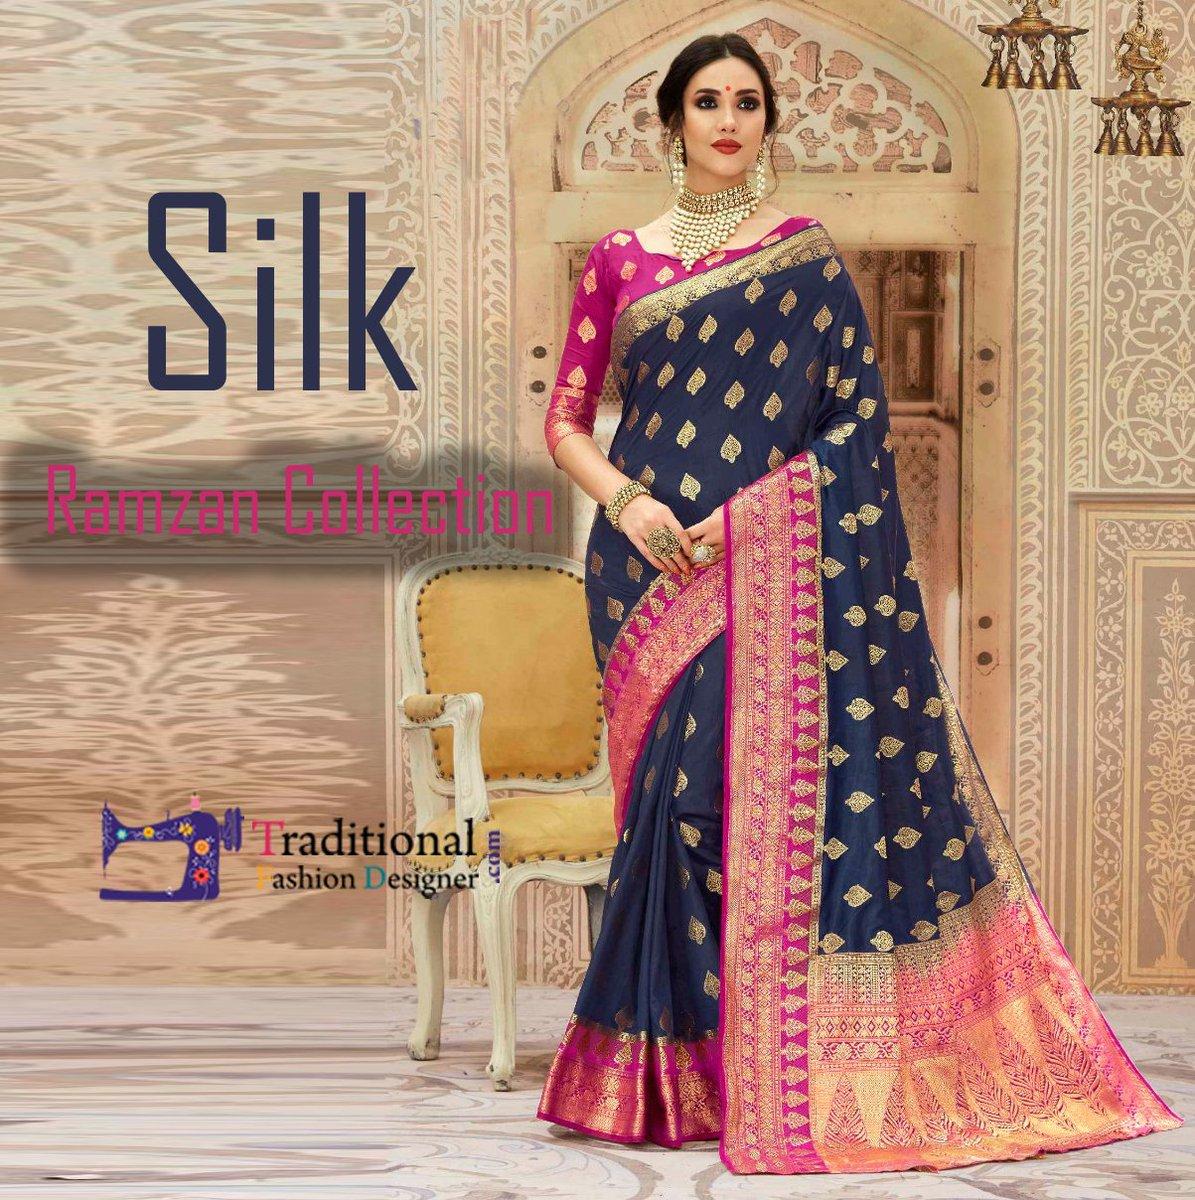 #Bollywood #Actress #Saree #Partywear #Traditionalwear #Fashion #Designewear #Wedding #BridalWear #Stylish #Indianlook